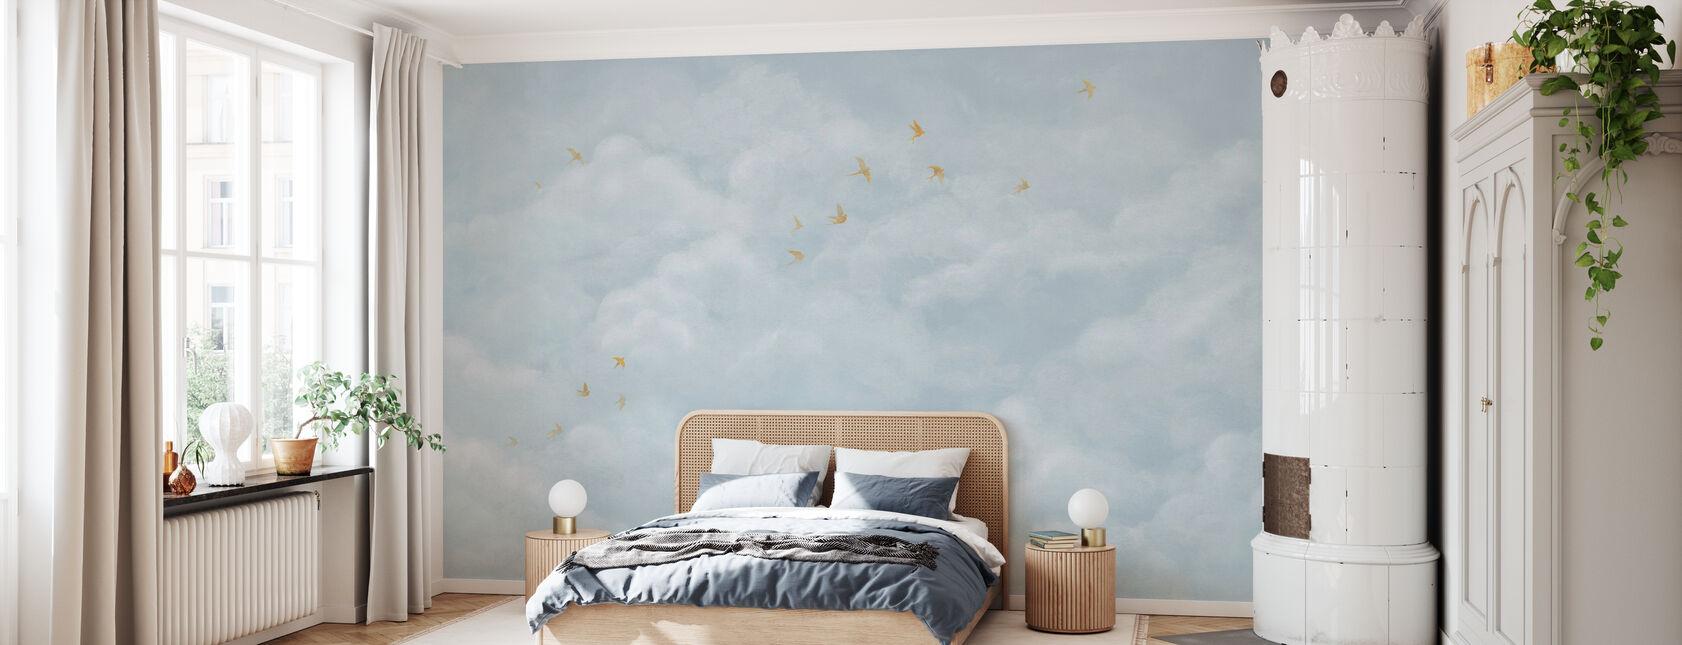 Tedere wolken met gele zwaluwen - zacht blauw - Behang - Slaapkamer